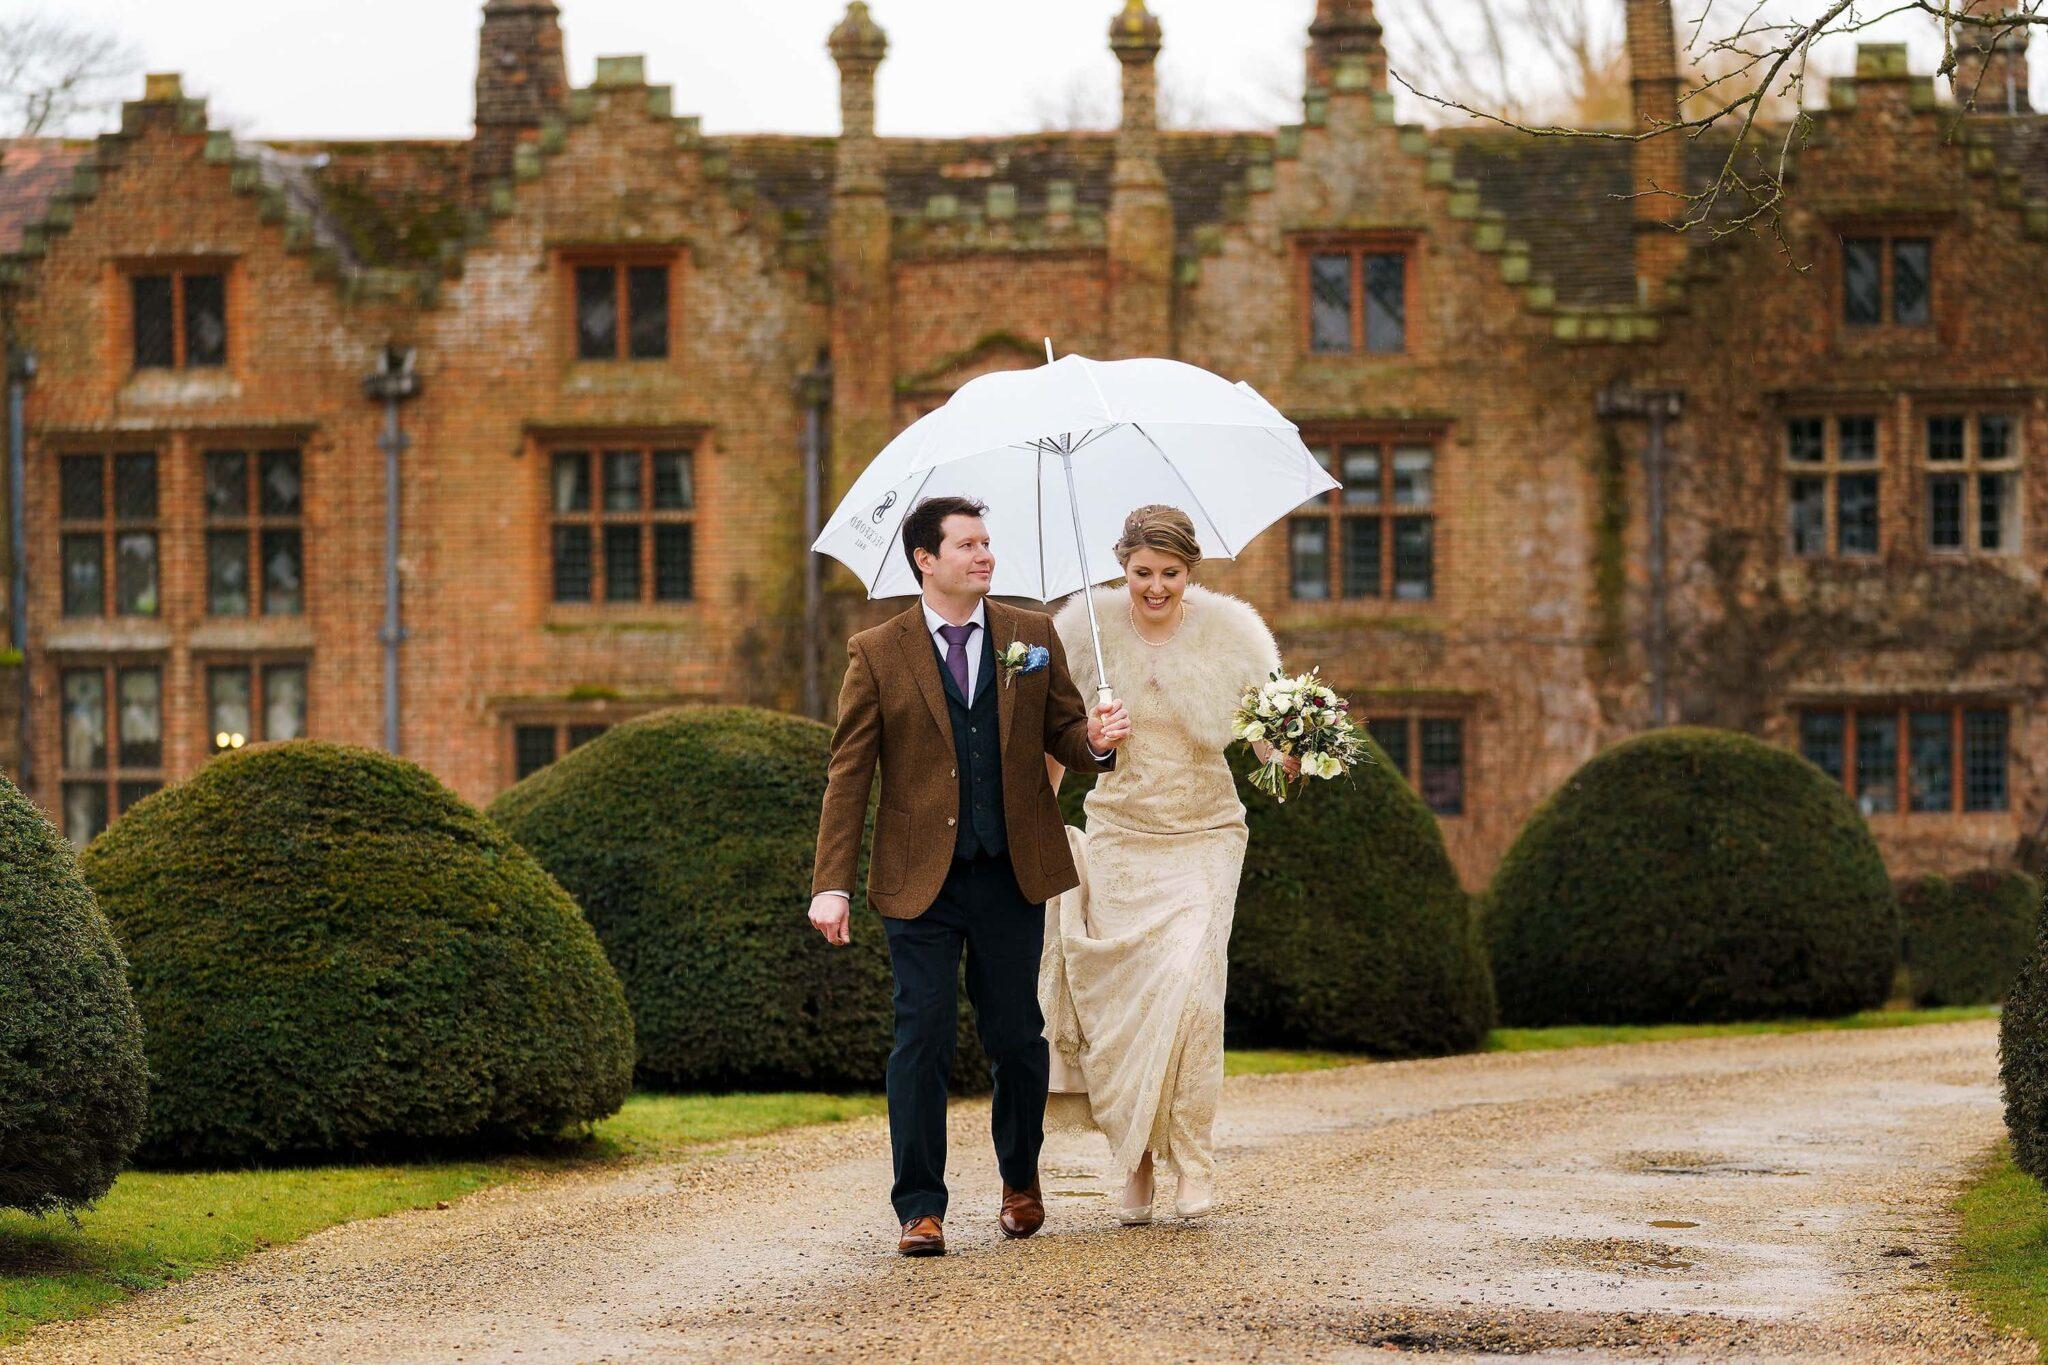 Seckford Hall wedding photos of Sophie & Tom